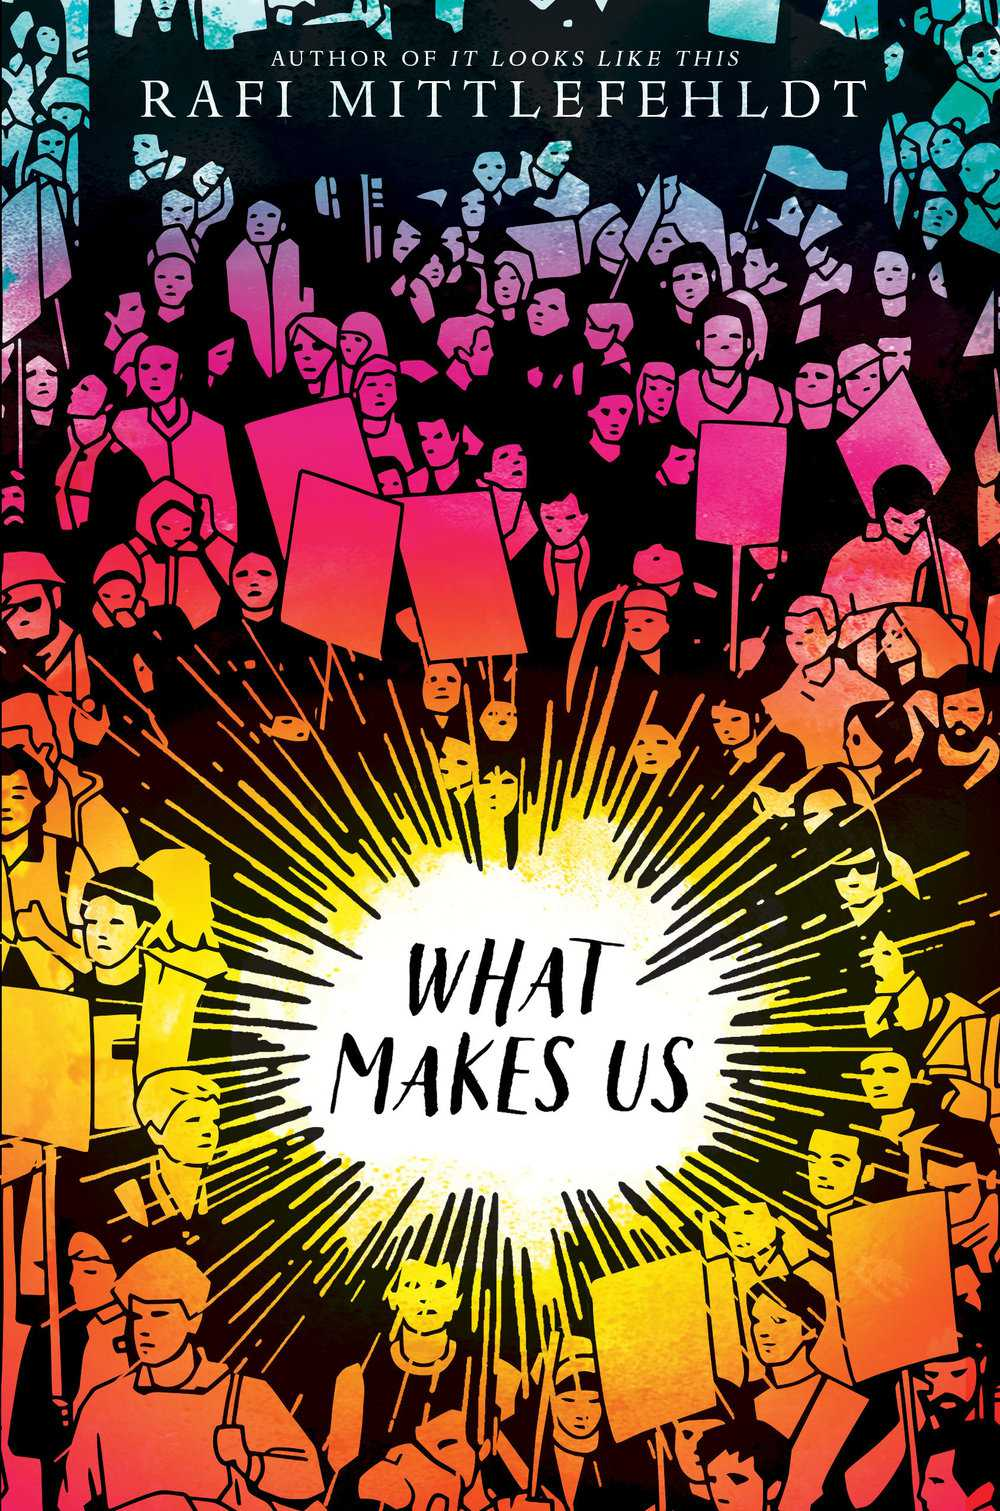 'What Makes Us' by Rafi Mittlefehldt